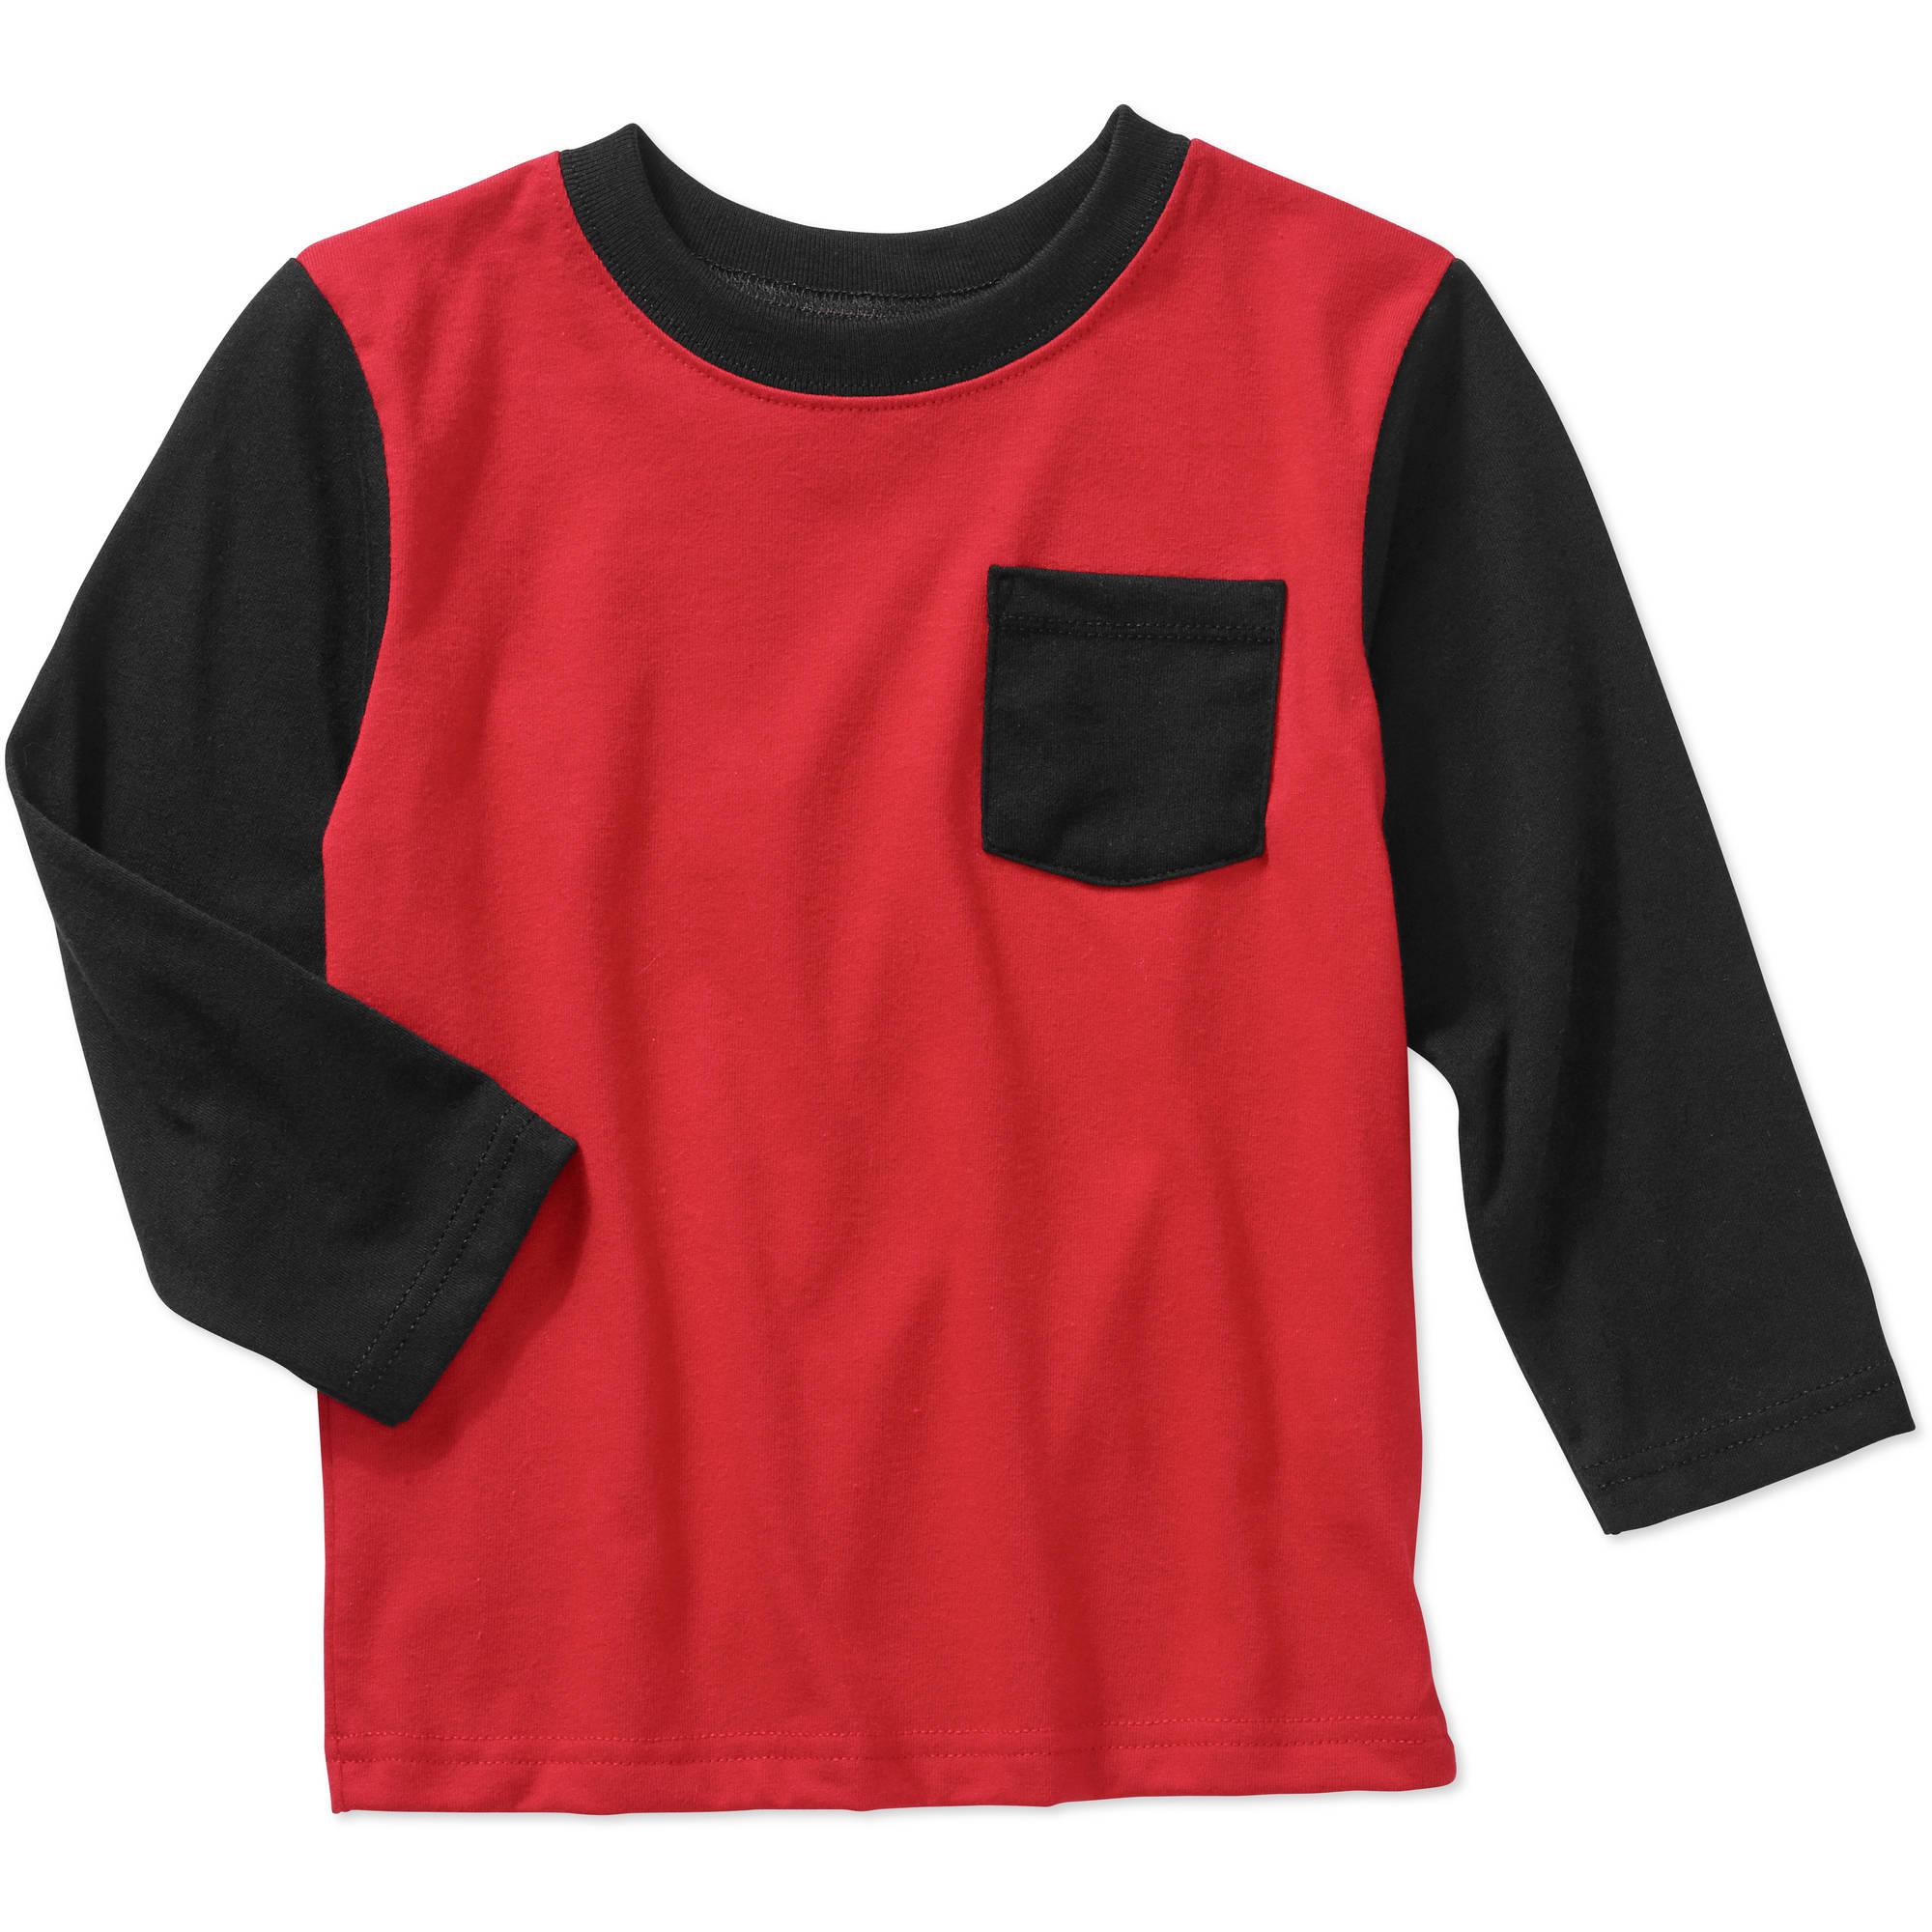 Garanimals Baby Toddler Boys' Long Sleeve Colorblock Pocket Tee Shirt